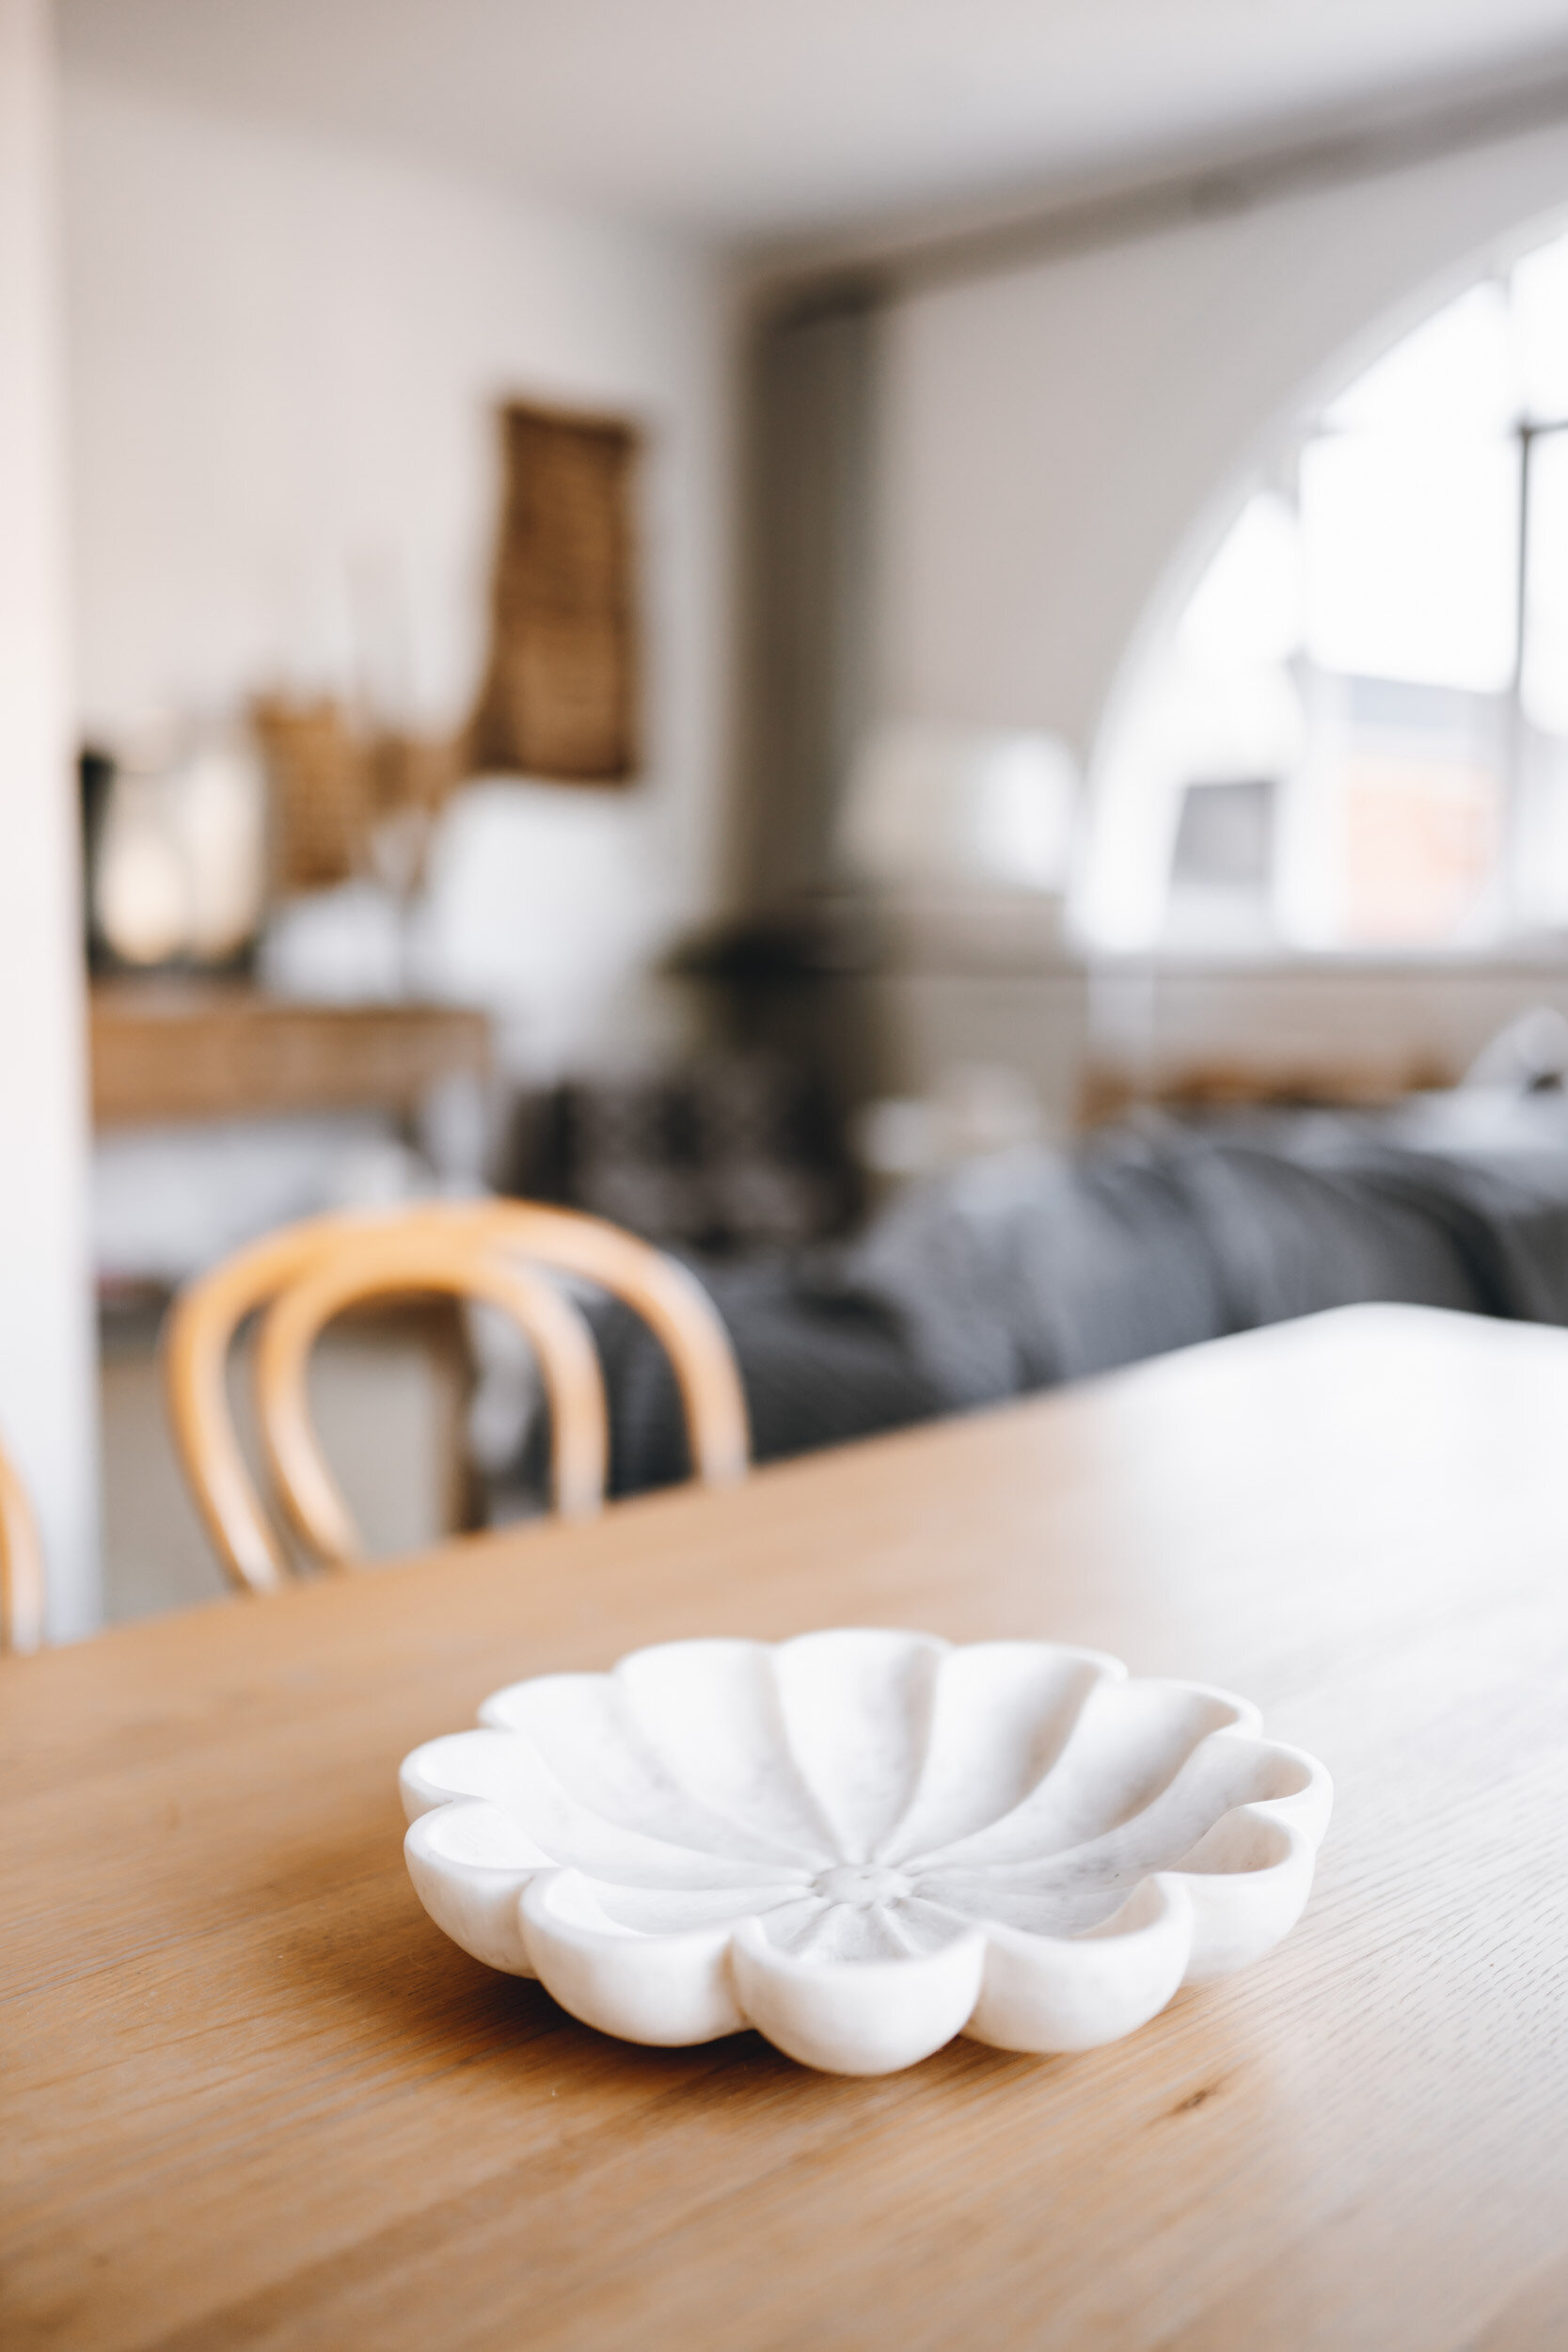 keira-mason-flourish-on-bull-street-clam-plate.jpg